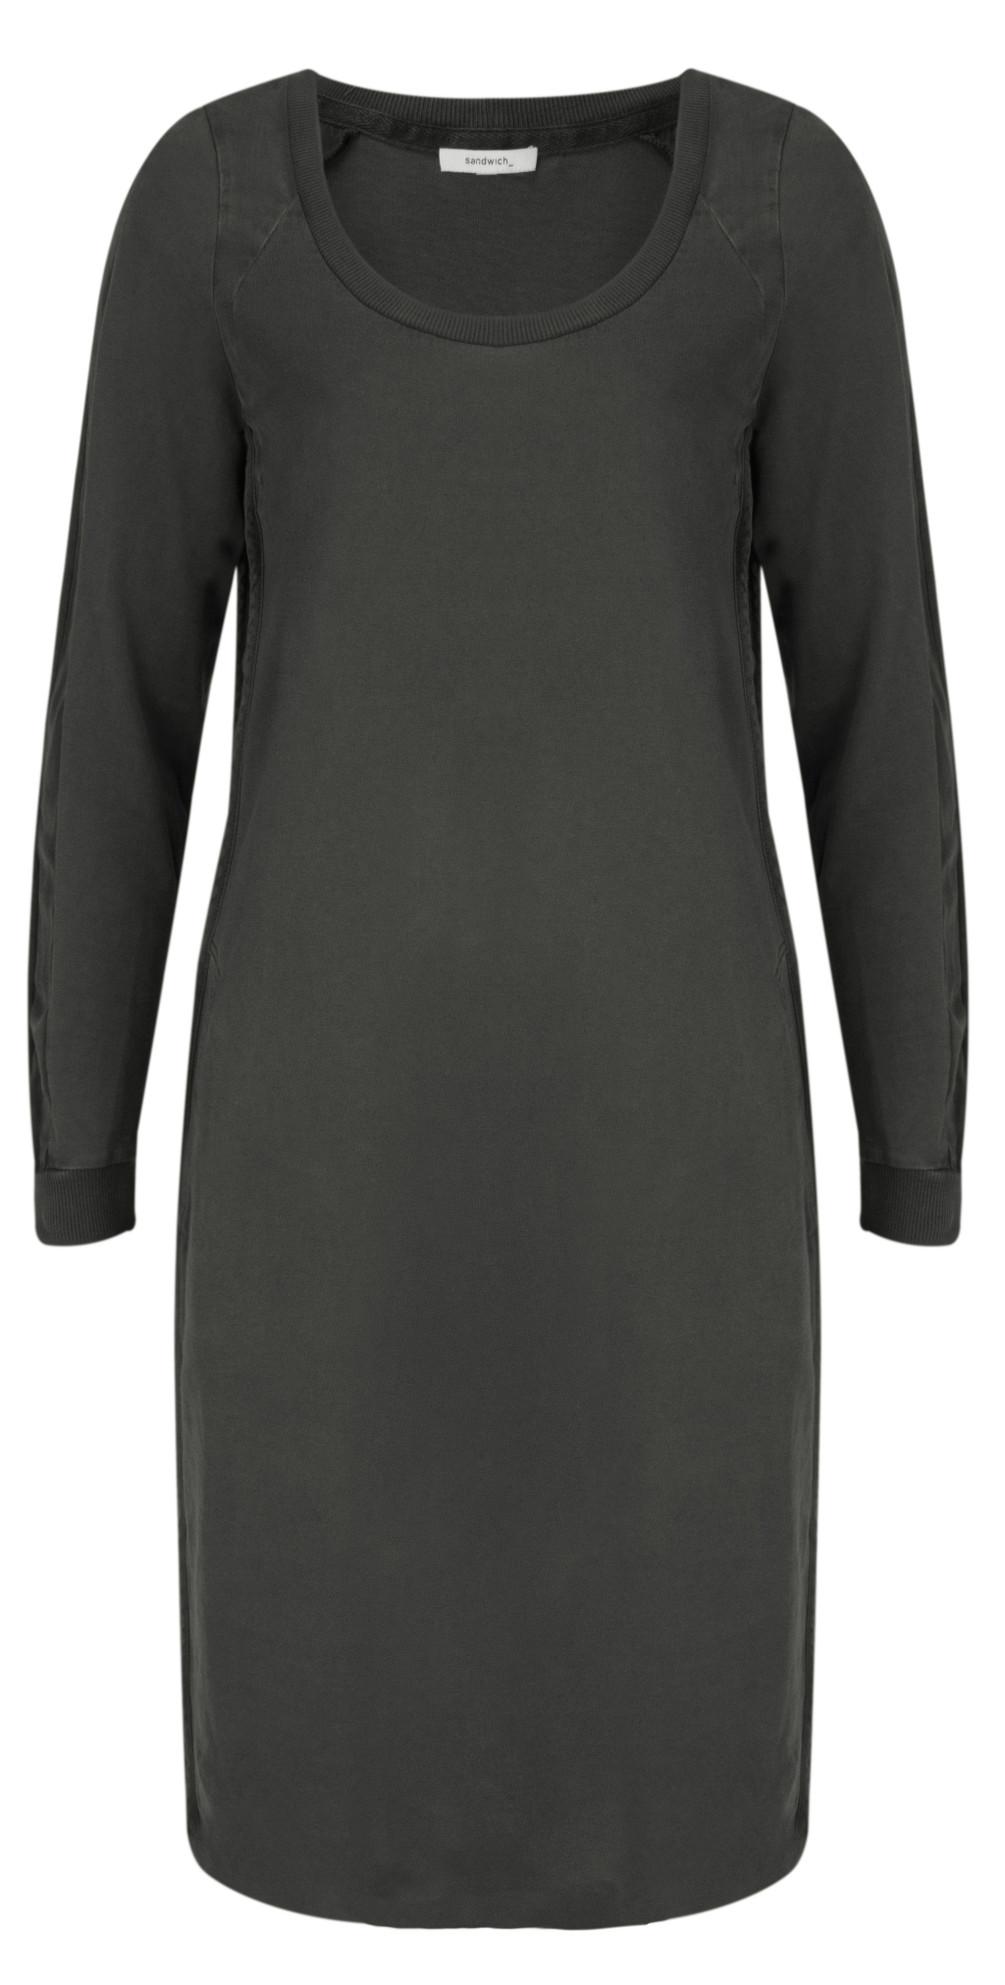 sandwich clothing single jersey dress in grey magnet. Black Bedroom Furniture Sets. Home Design Ideas